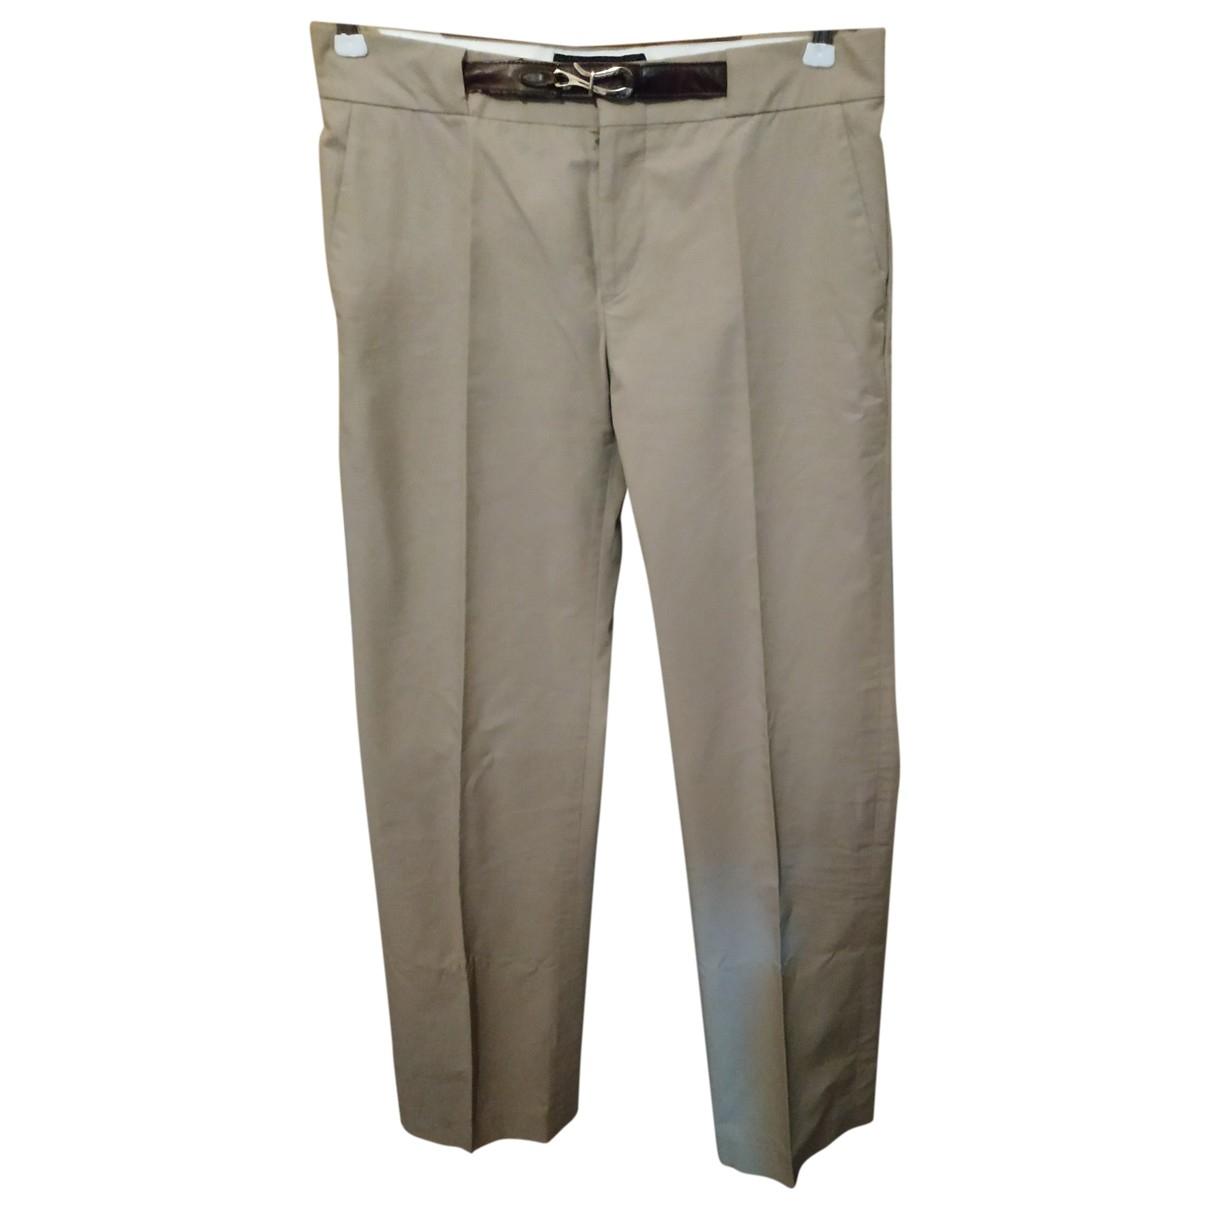 Gucci \N Beige Cotton Trousers for Women 40 IT